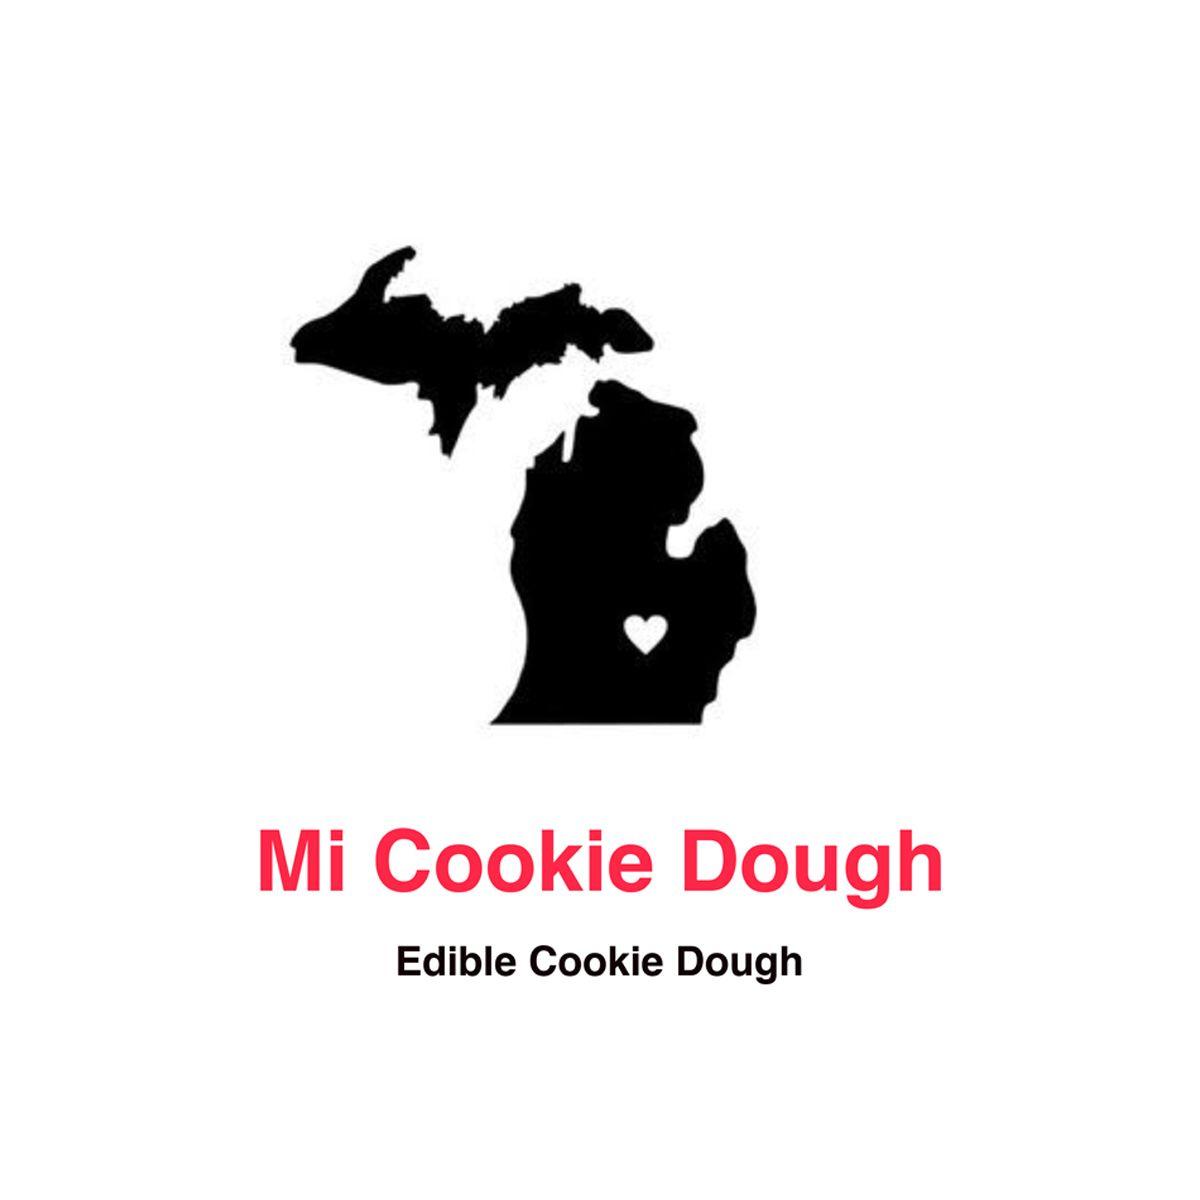 MICookieDough-TOL-2019